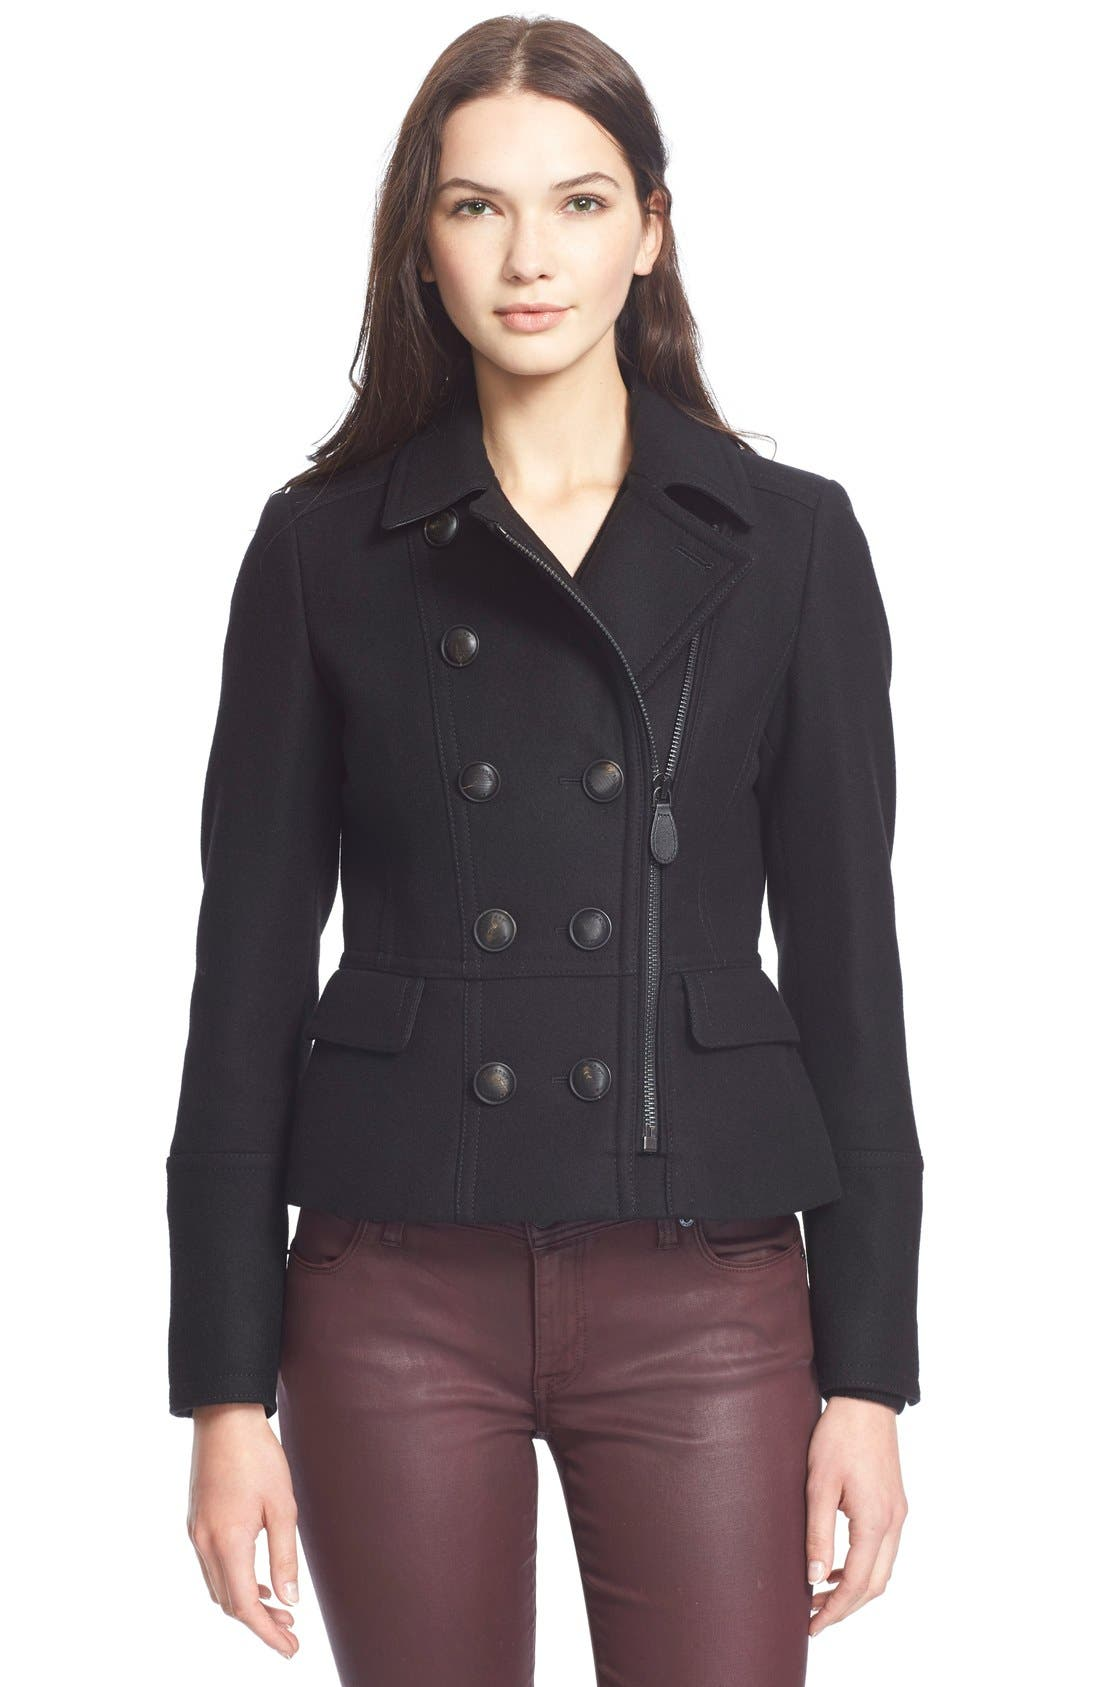 BURBERRY BRIT BuberryBrit 'Milbury' Wool Blend Jacket, Main, color, 001